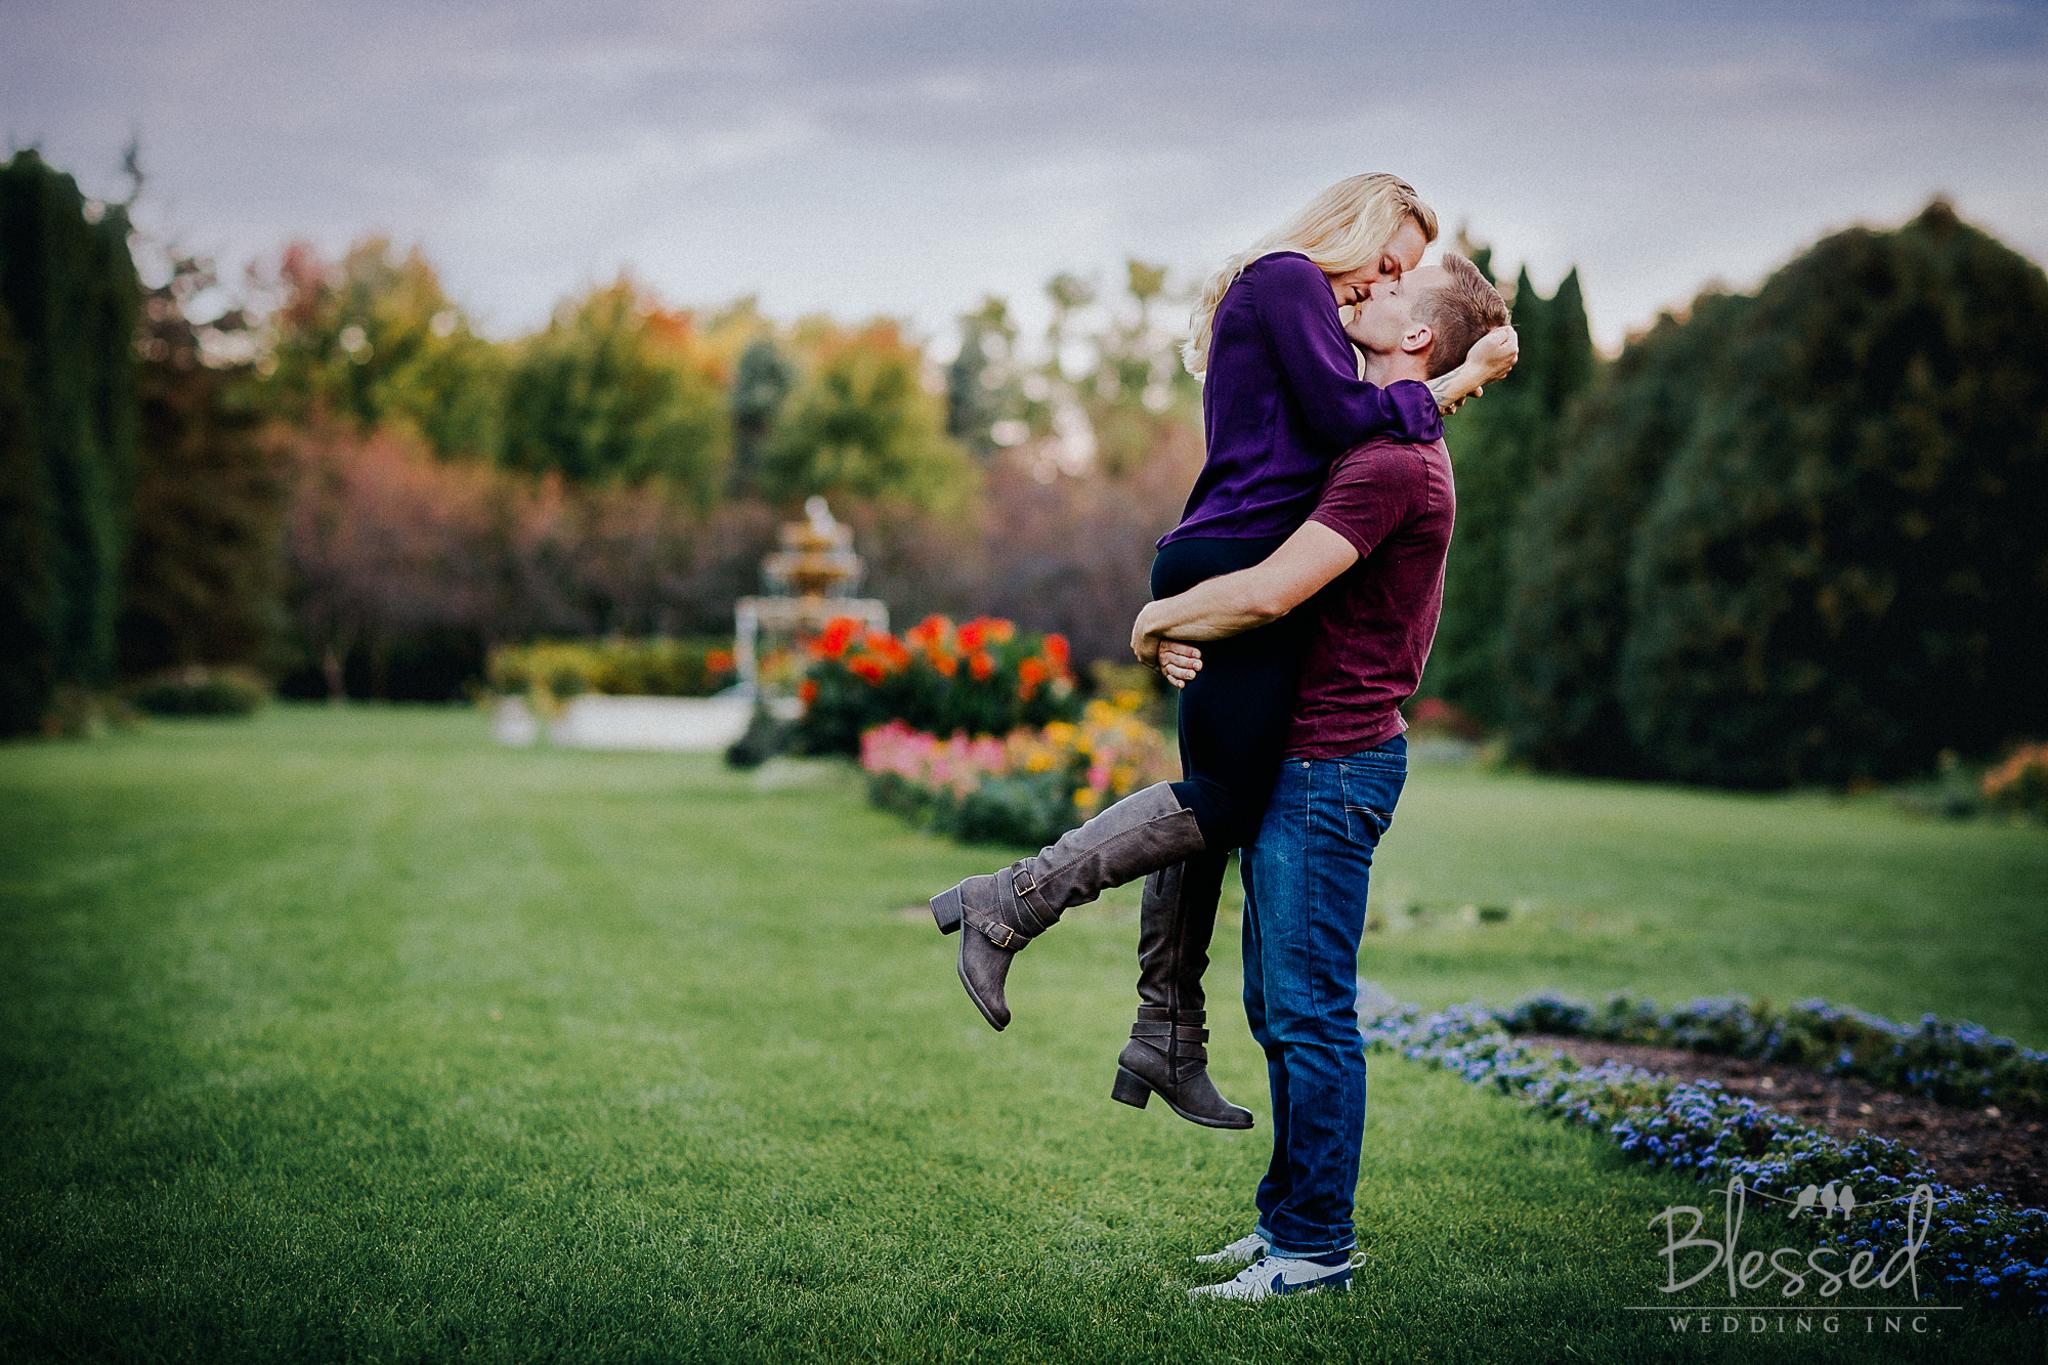 Destination Wedding Photography Minnesota By Blessed Wedding Photographers-16.jpg